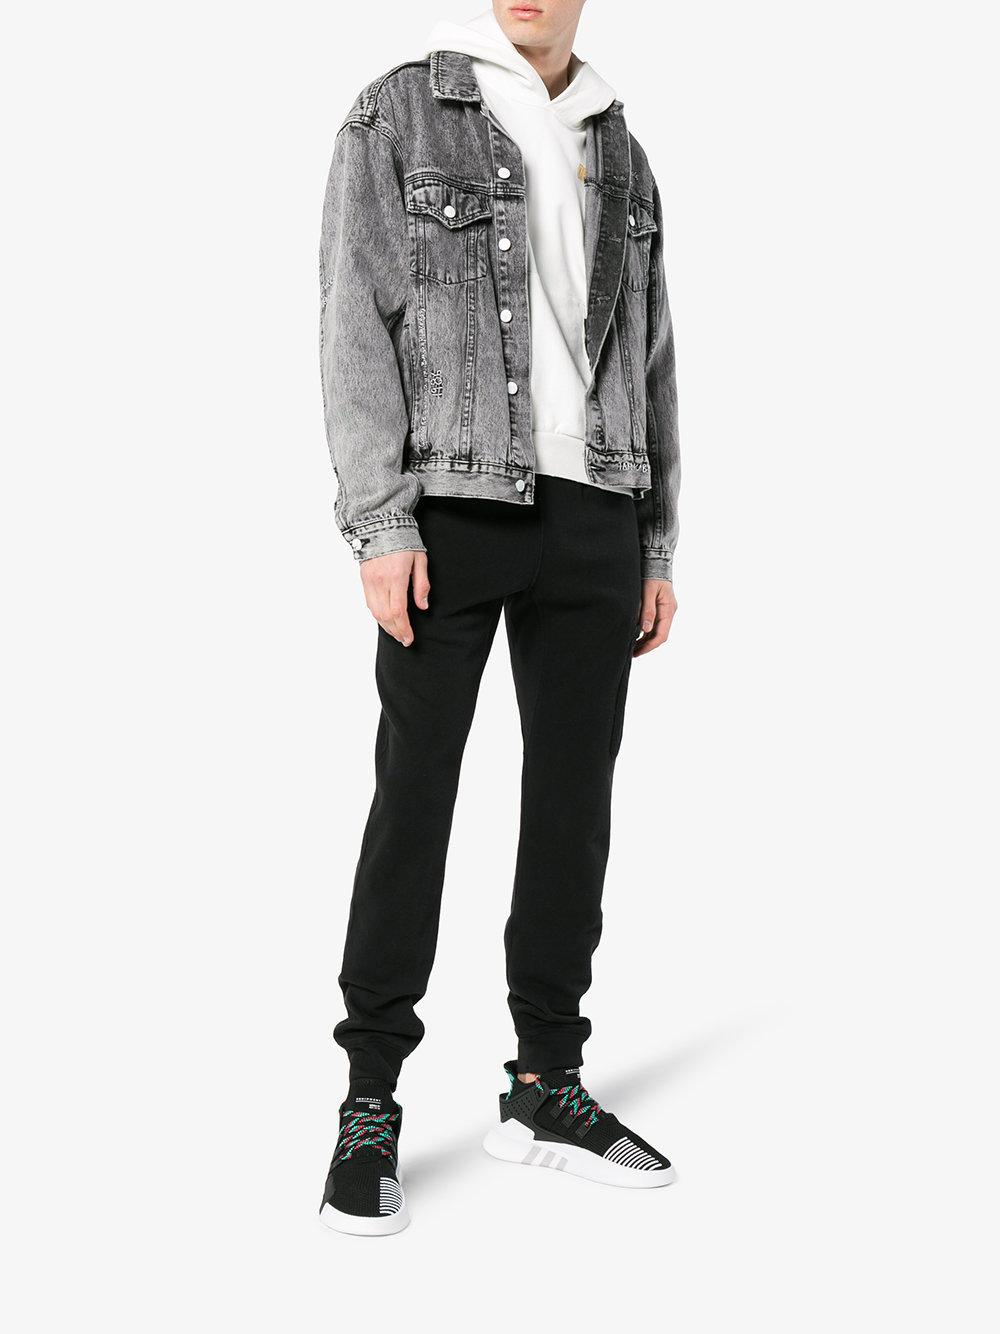 info for e1e8f 33097 $137, adidas Eqt Bask Adv Lace Up Sneakers